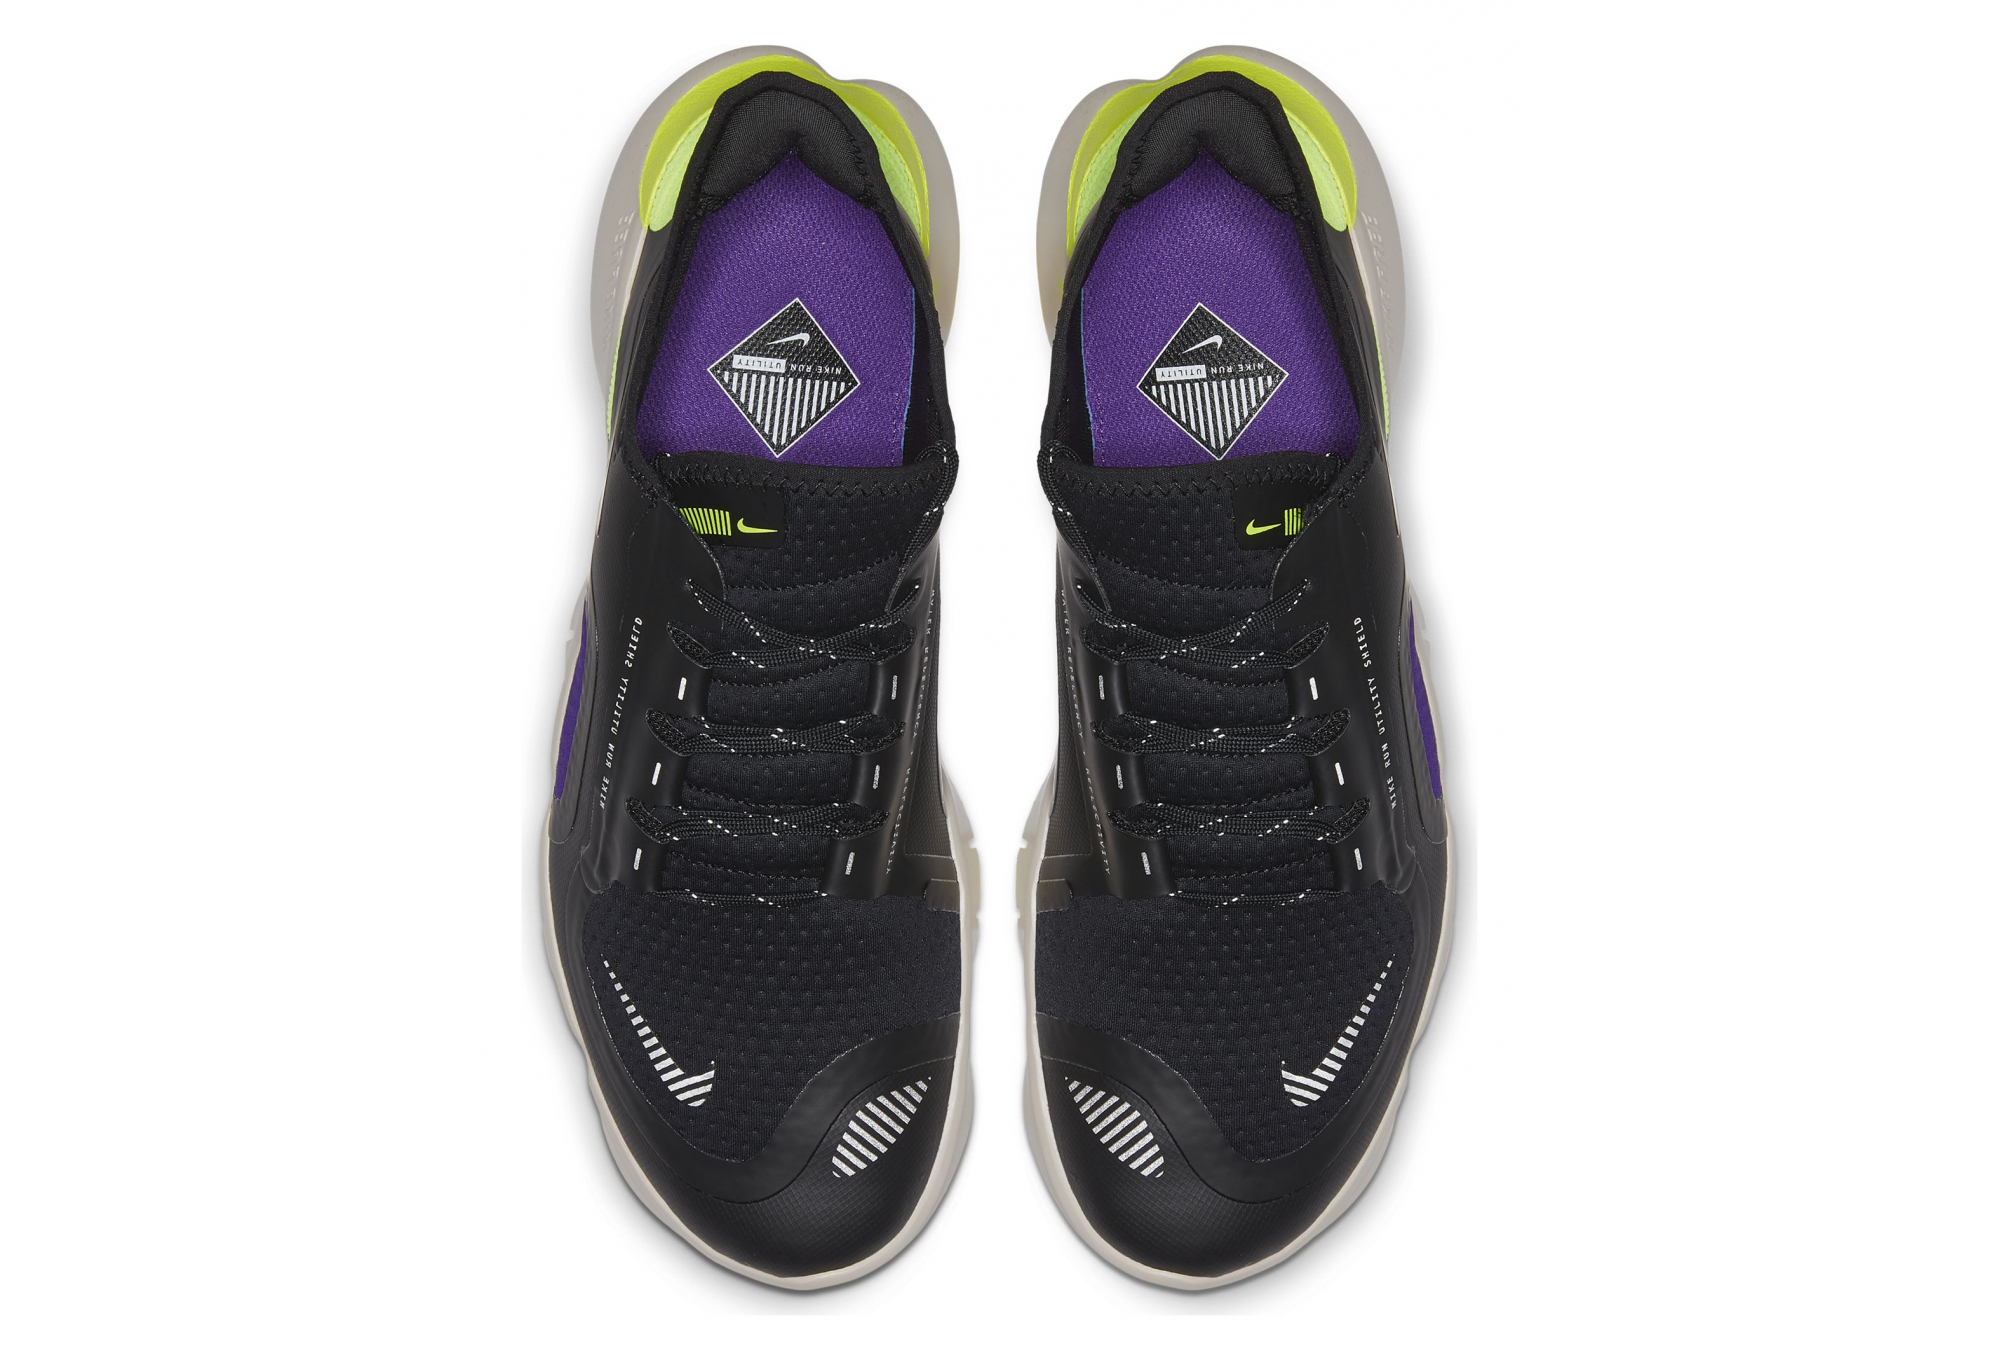 Contento Votación desconcertado  Nike Running shoes Free RN 5.0 Shield Black Yellow Purple | Alltricks.com